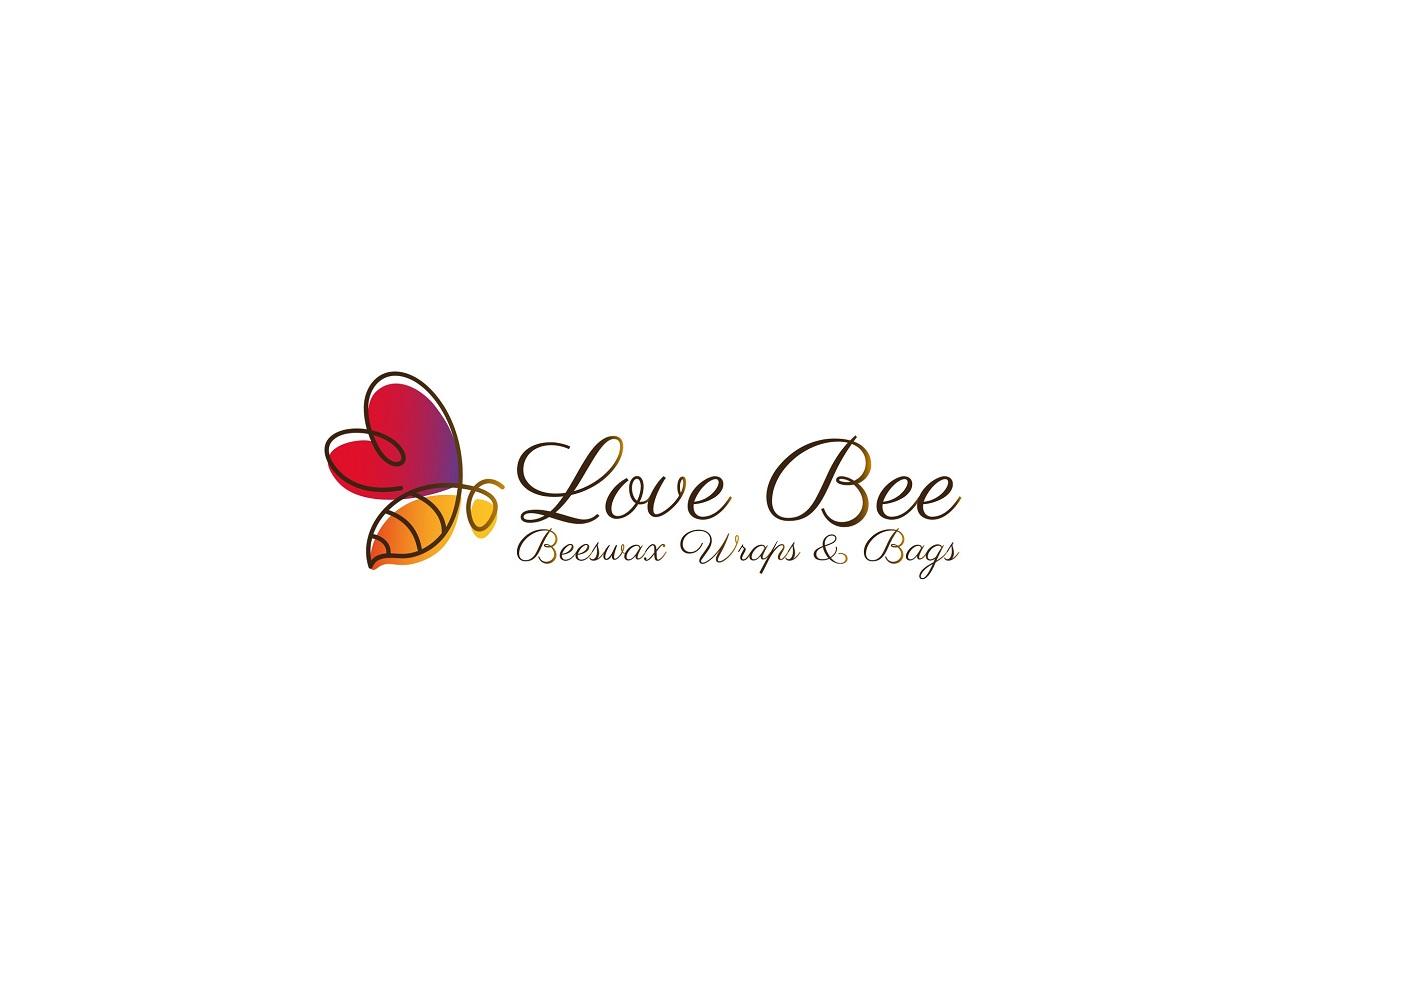 Love Bee Ireland